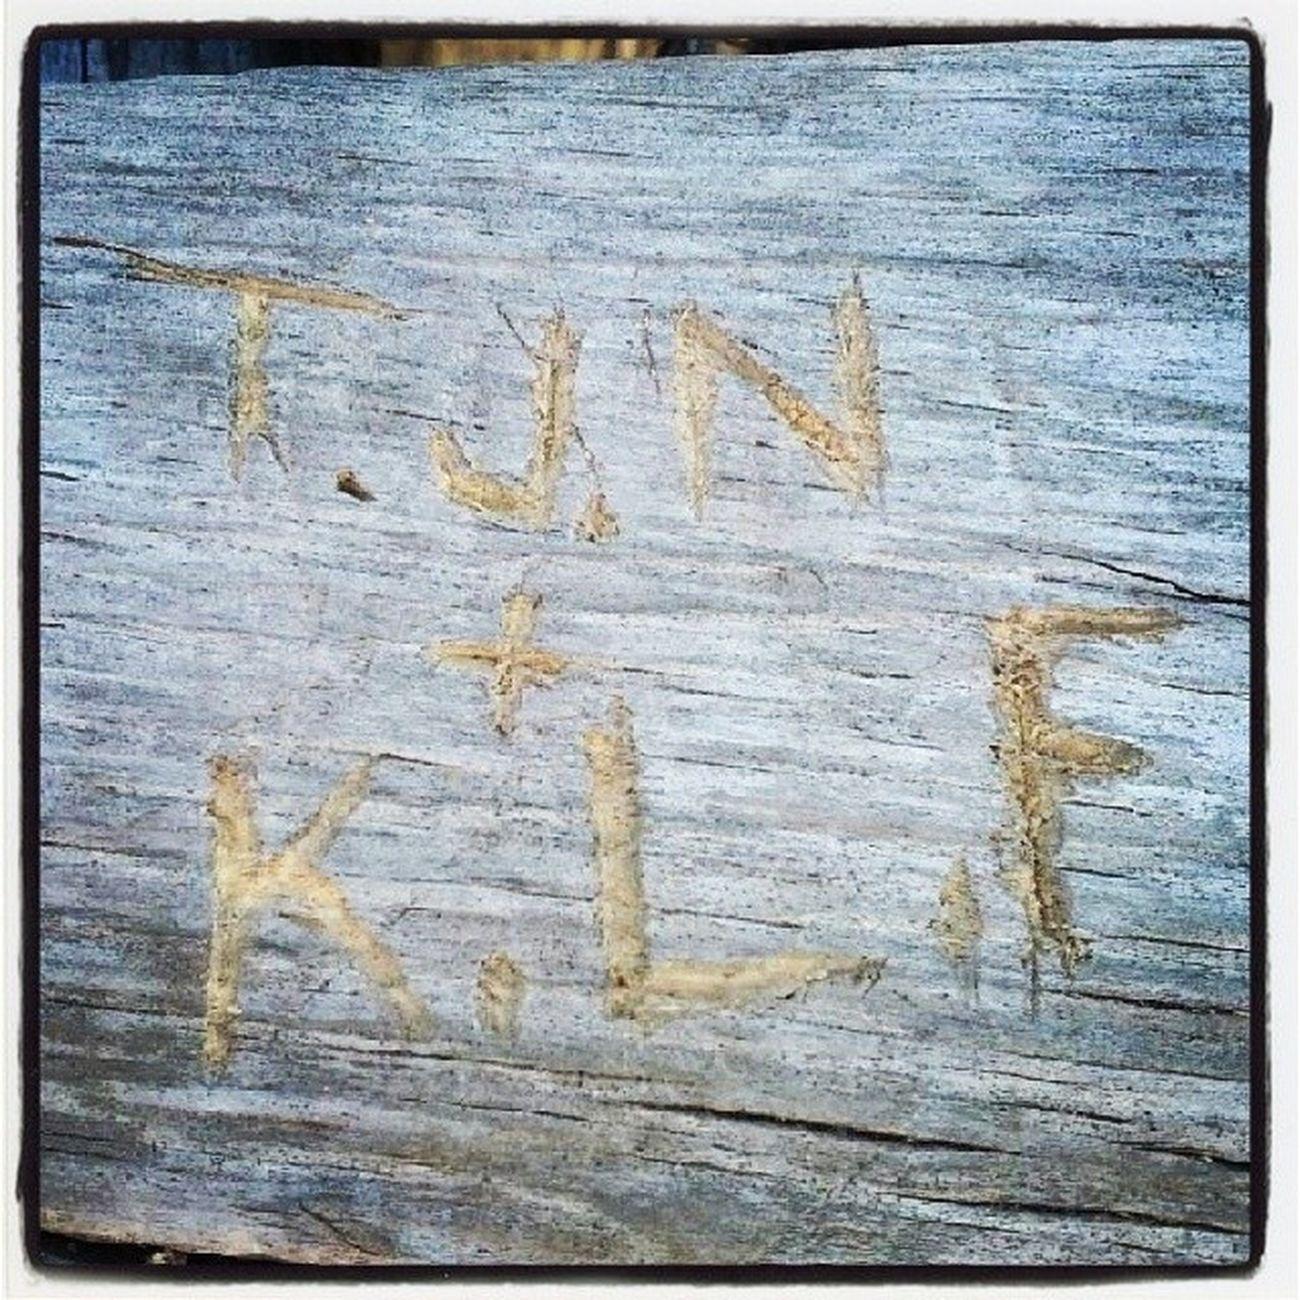 He carved our initials in a bench at the grand canyon Initials Love Interraciallove Grandcanyonvillage grandcanyon az arizona roadtrip couplesweekend mountains canyon coloradoriver tyler tk katlynn boo boof az arizona